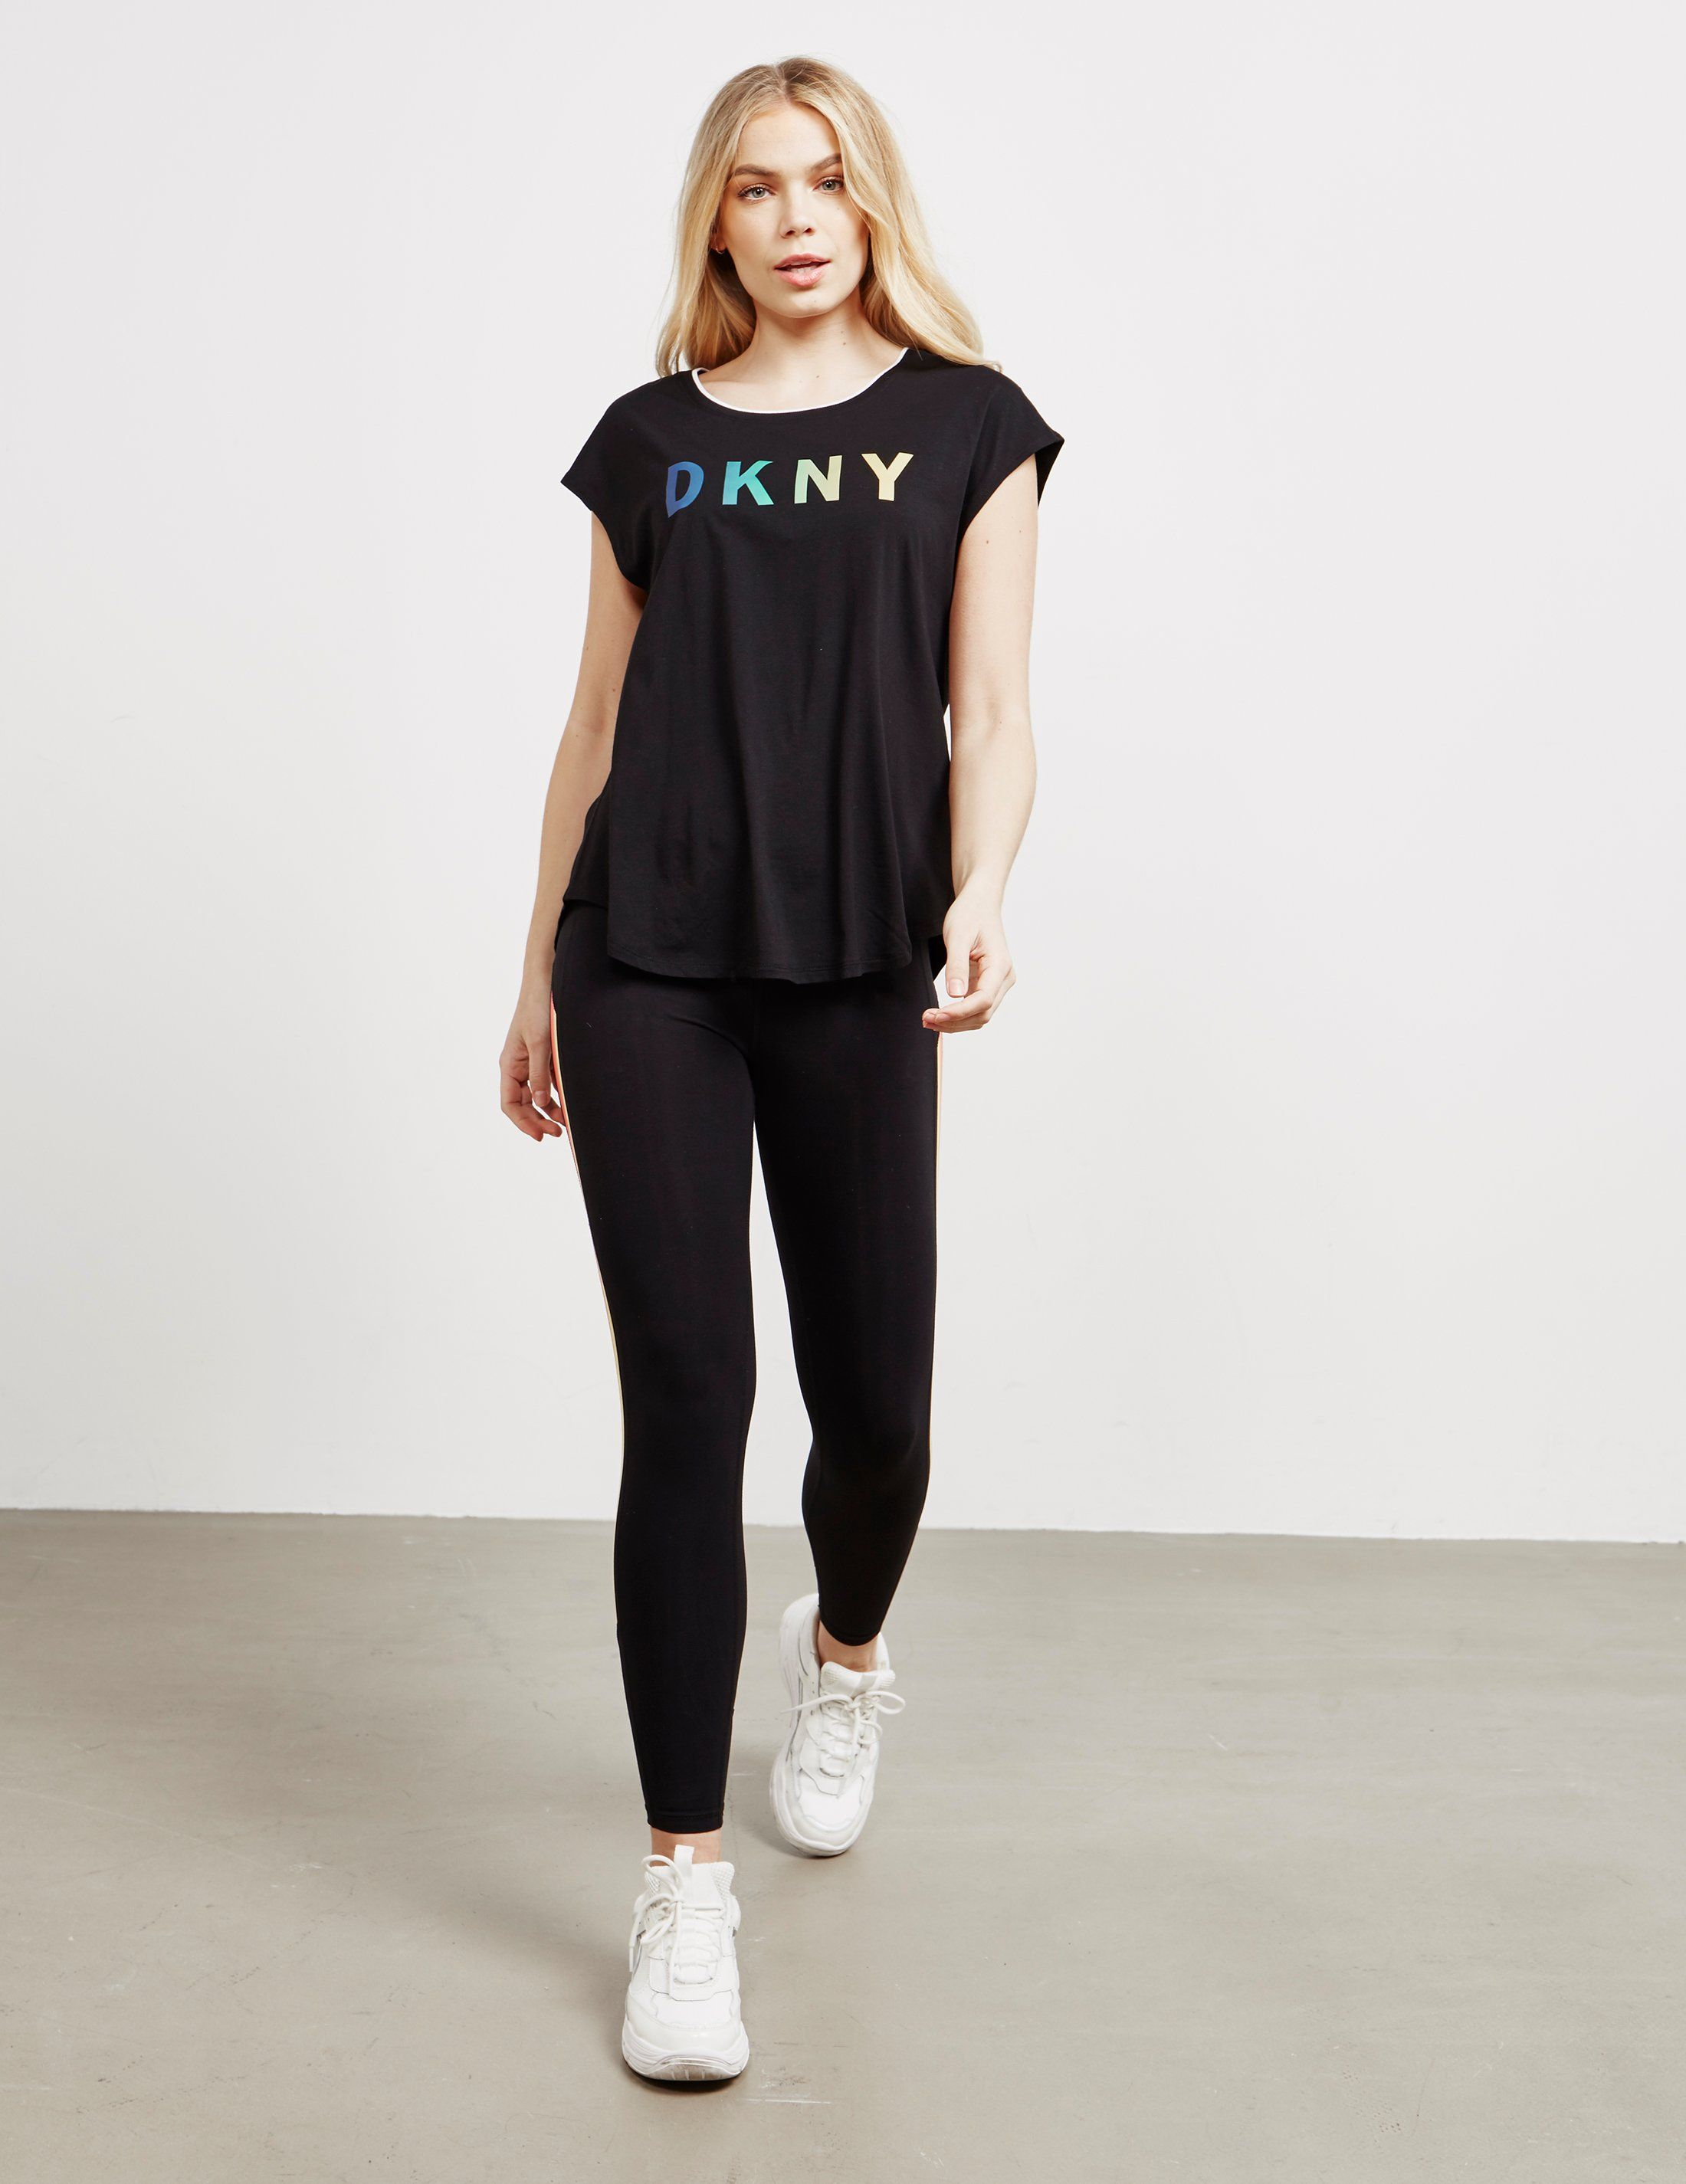 DKNY Rainbow Logo Short Sleeve T-Shirt